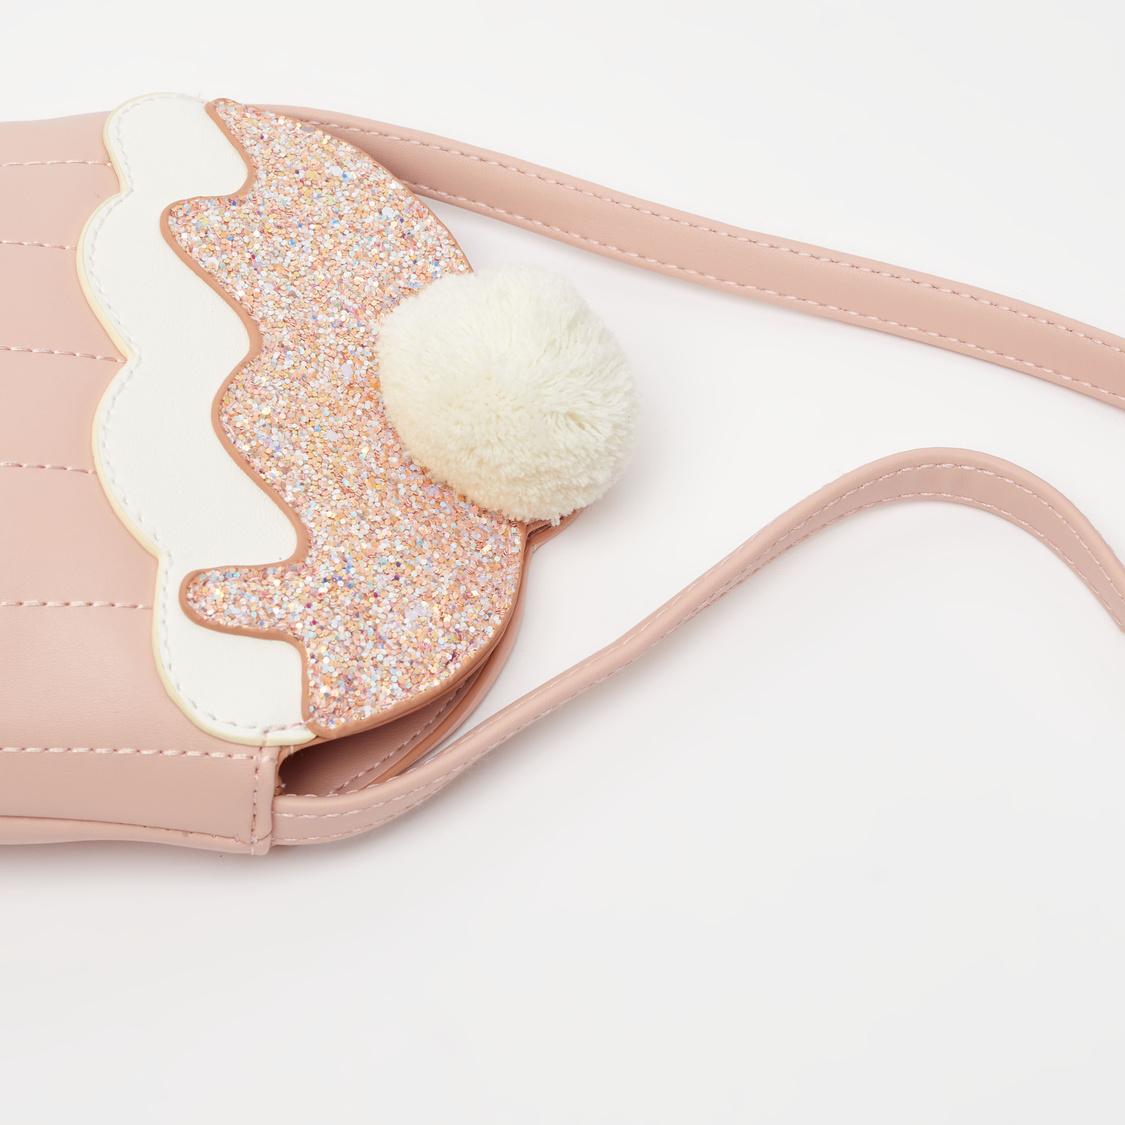 Embellished Crossbody Bag with Pom-Pom Accent